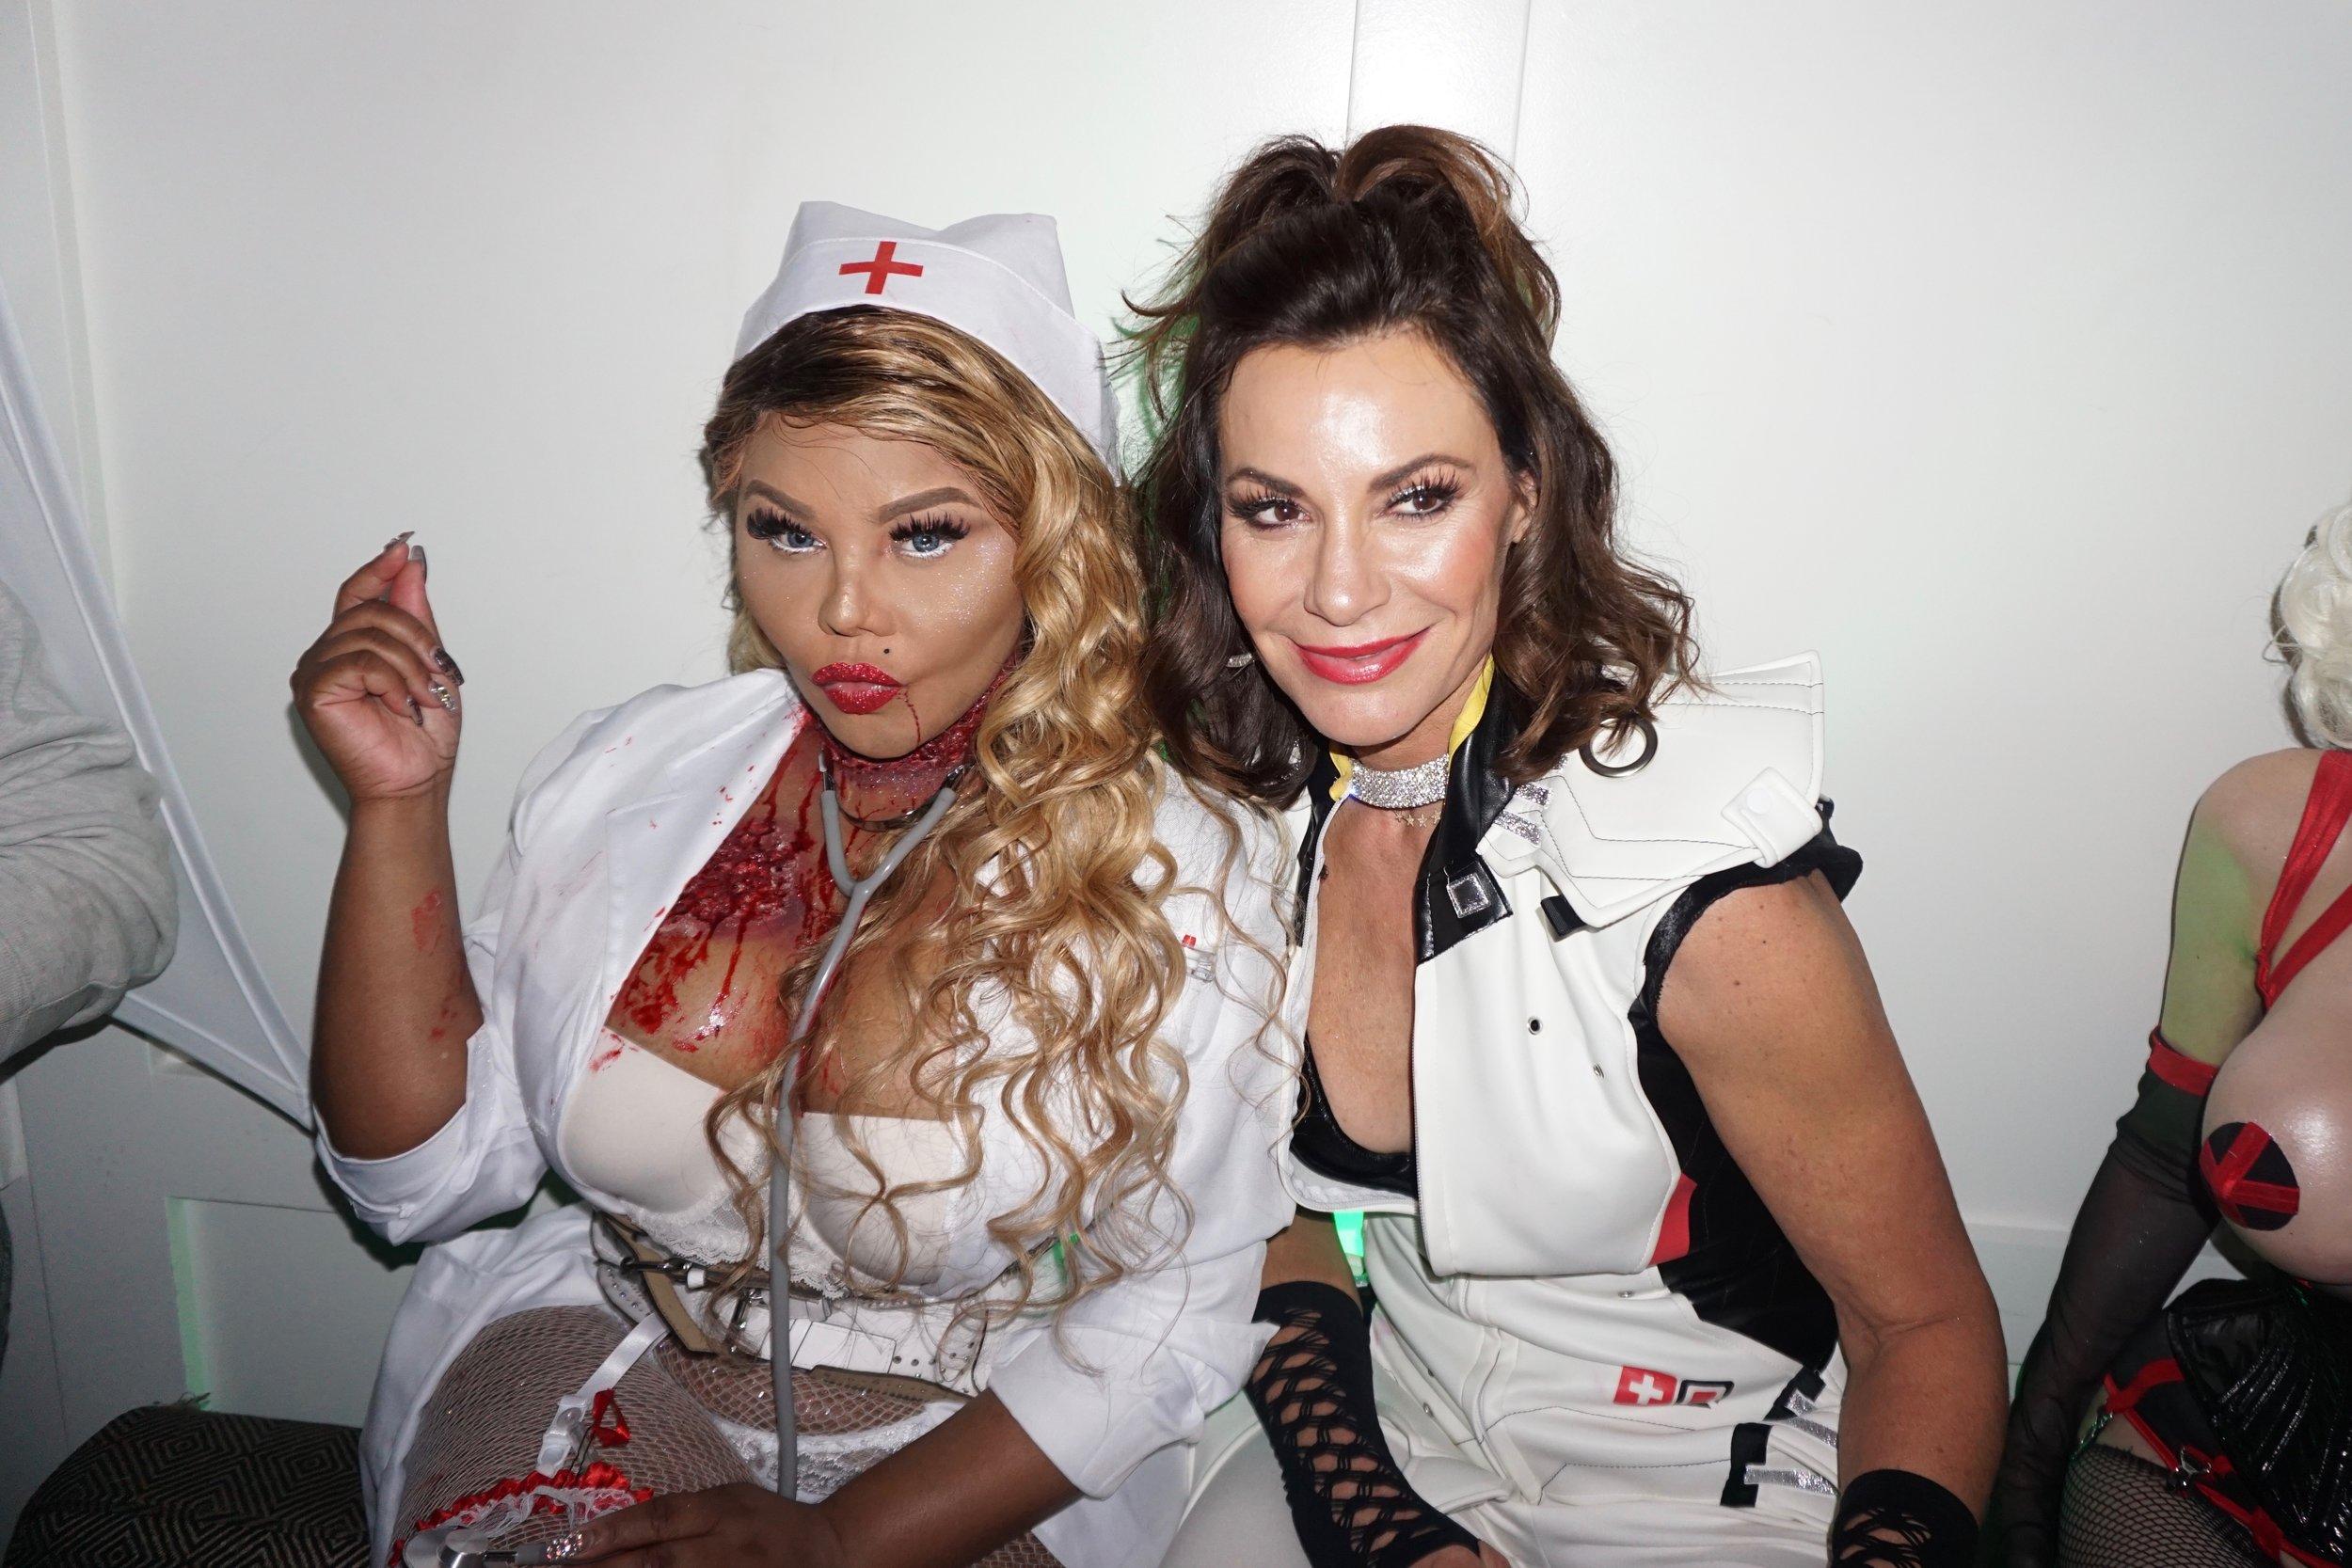 Hospital 849 Celebs - 54 Lil Kim, Luann de Lesseps.jpg